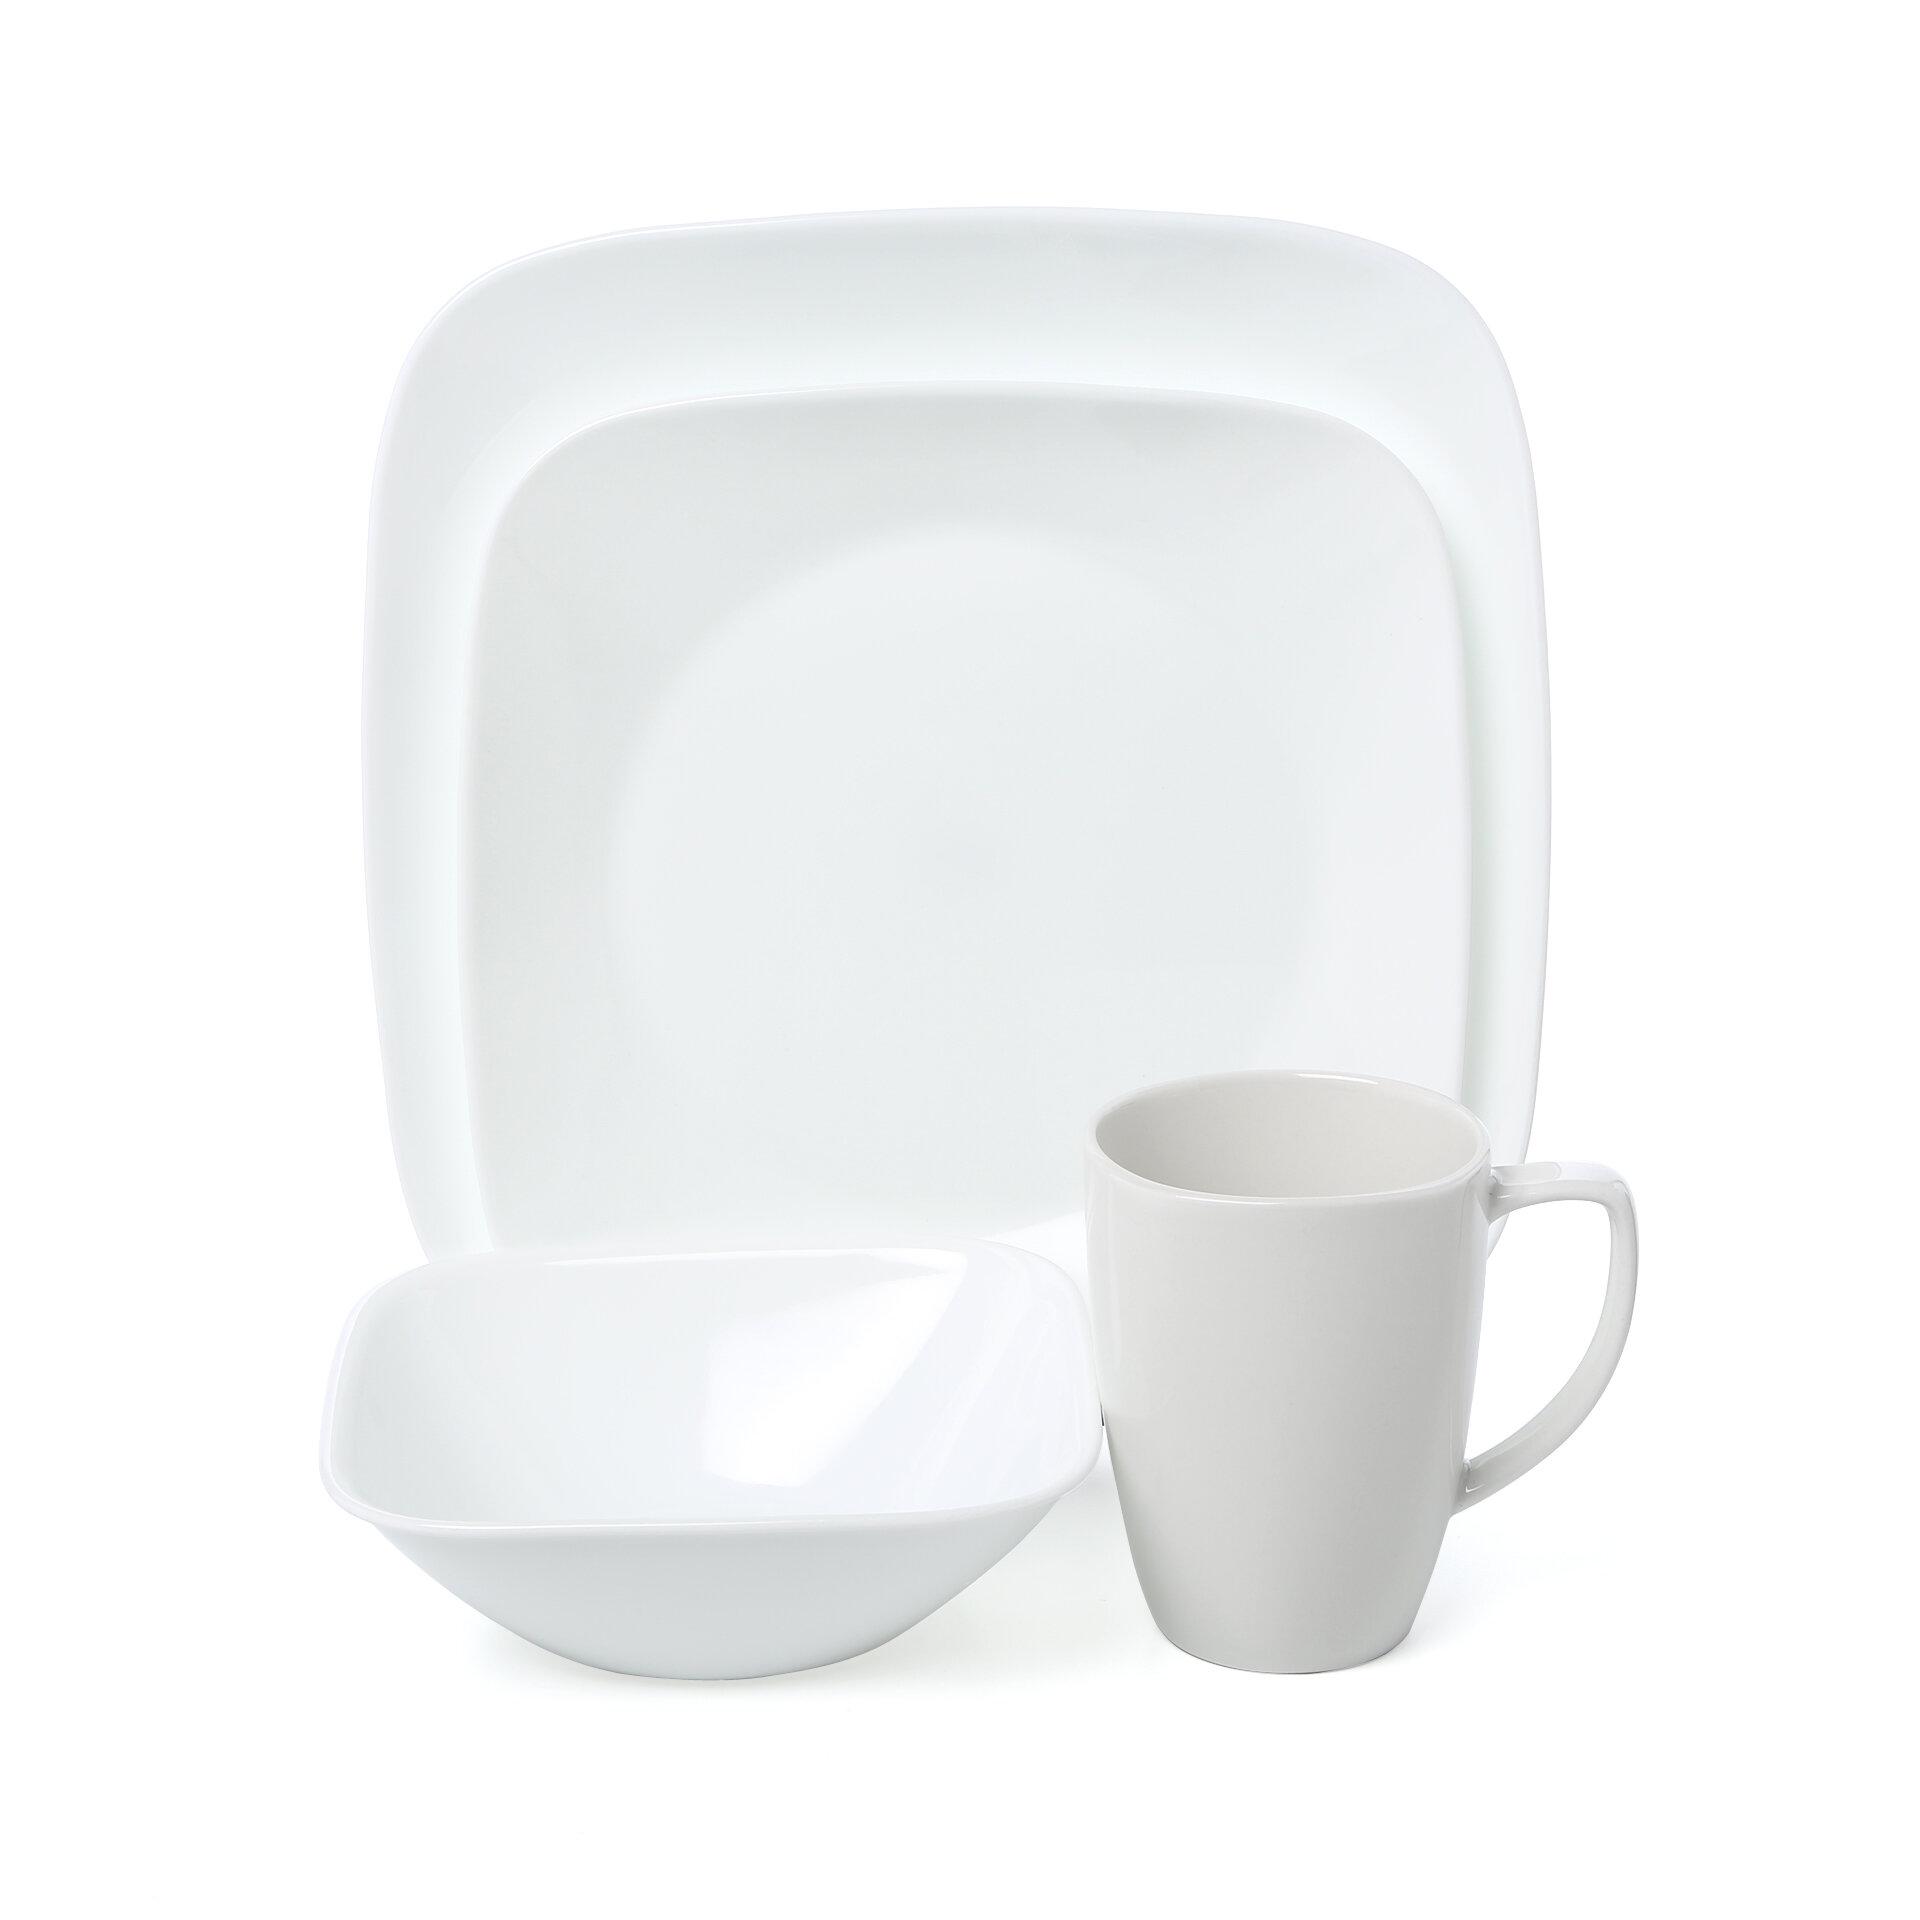 Corelle 16 Piece Dinnerware Set Vitrelle Glass Service of 4 Square White Plates